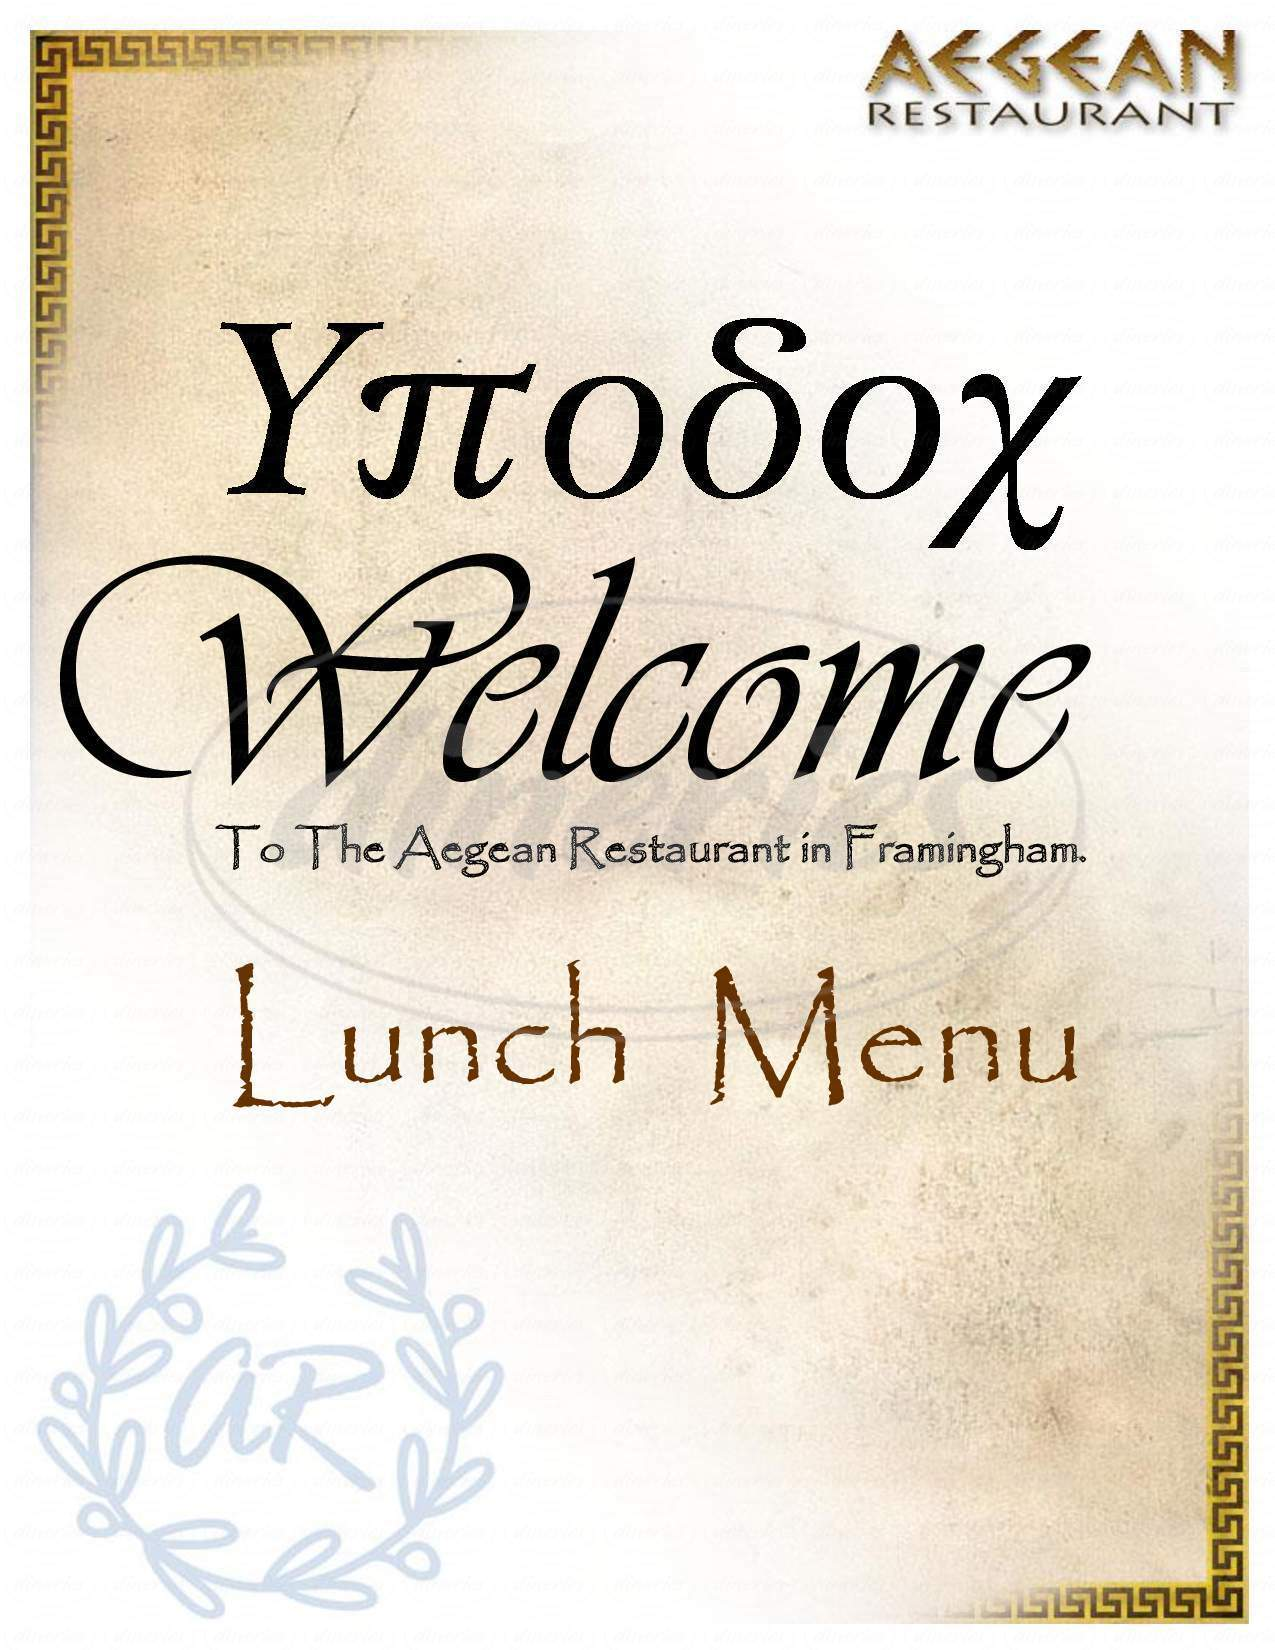 menu for Aegean Restaurant